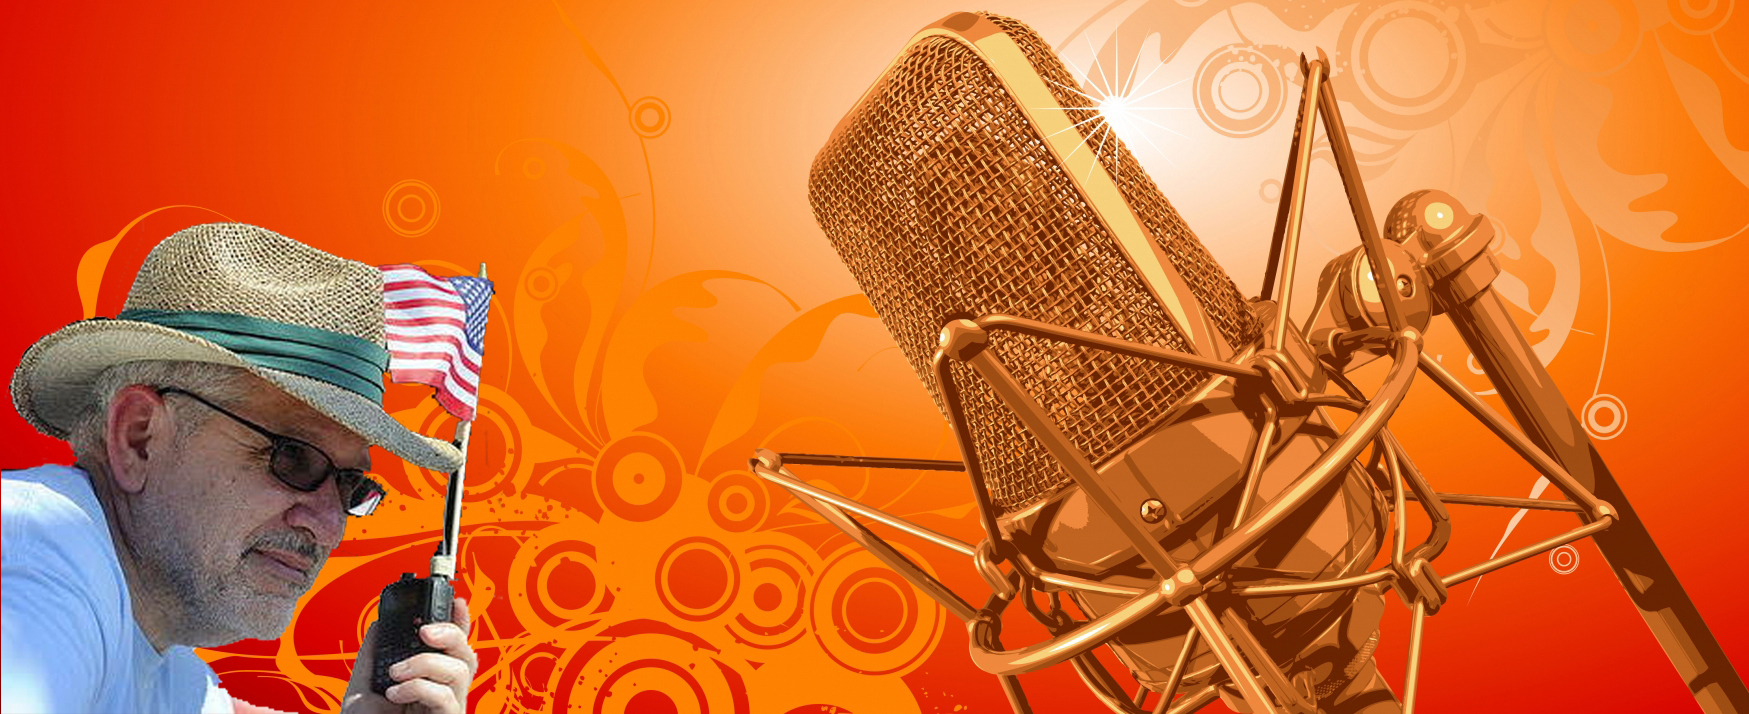 ICQPodcast_OrangeMic-without-text_dan.jpg